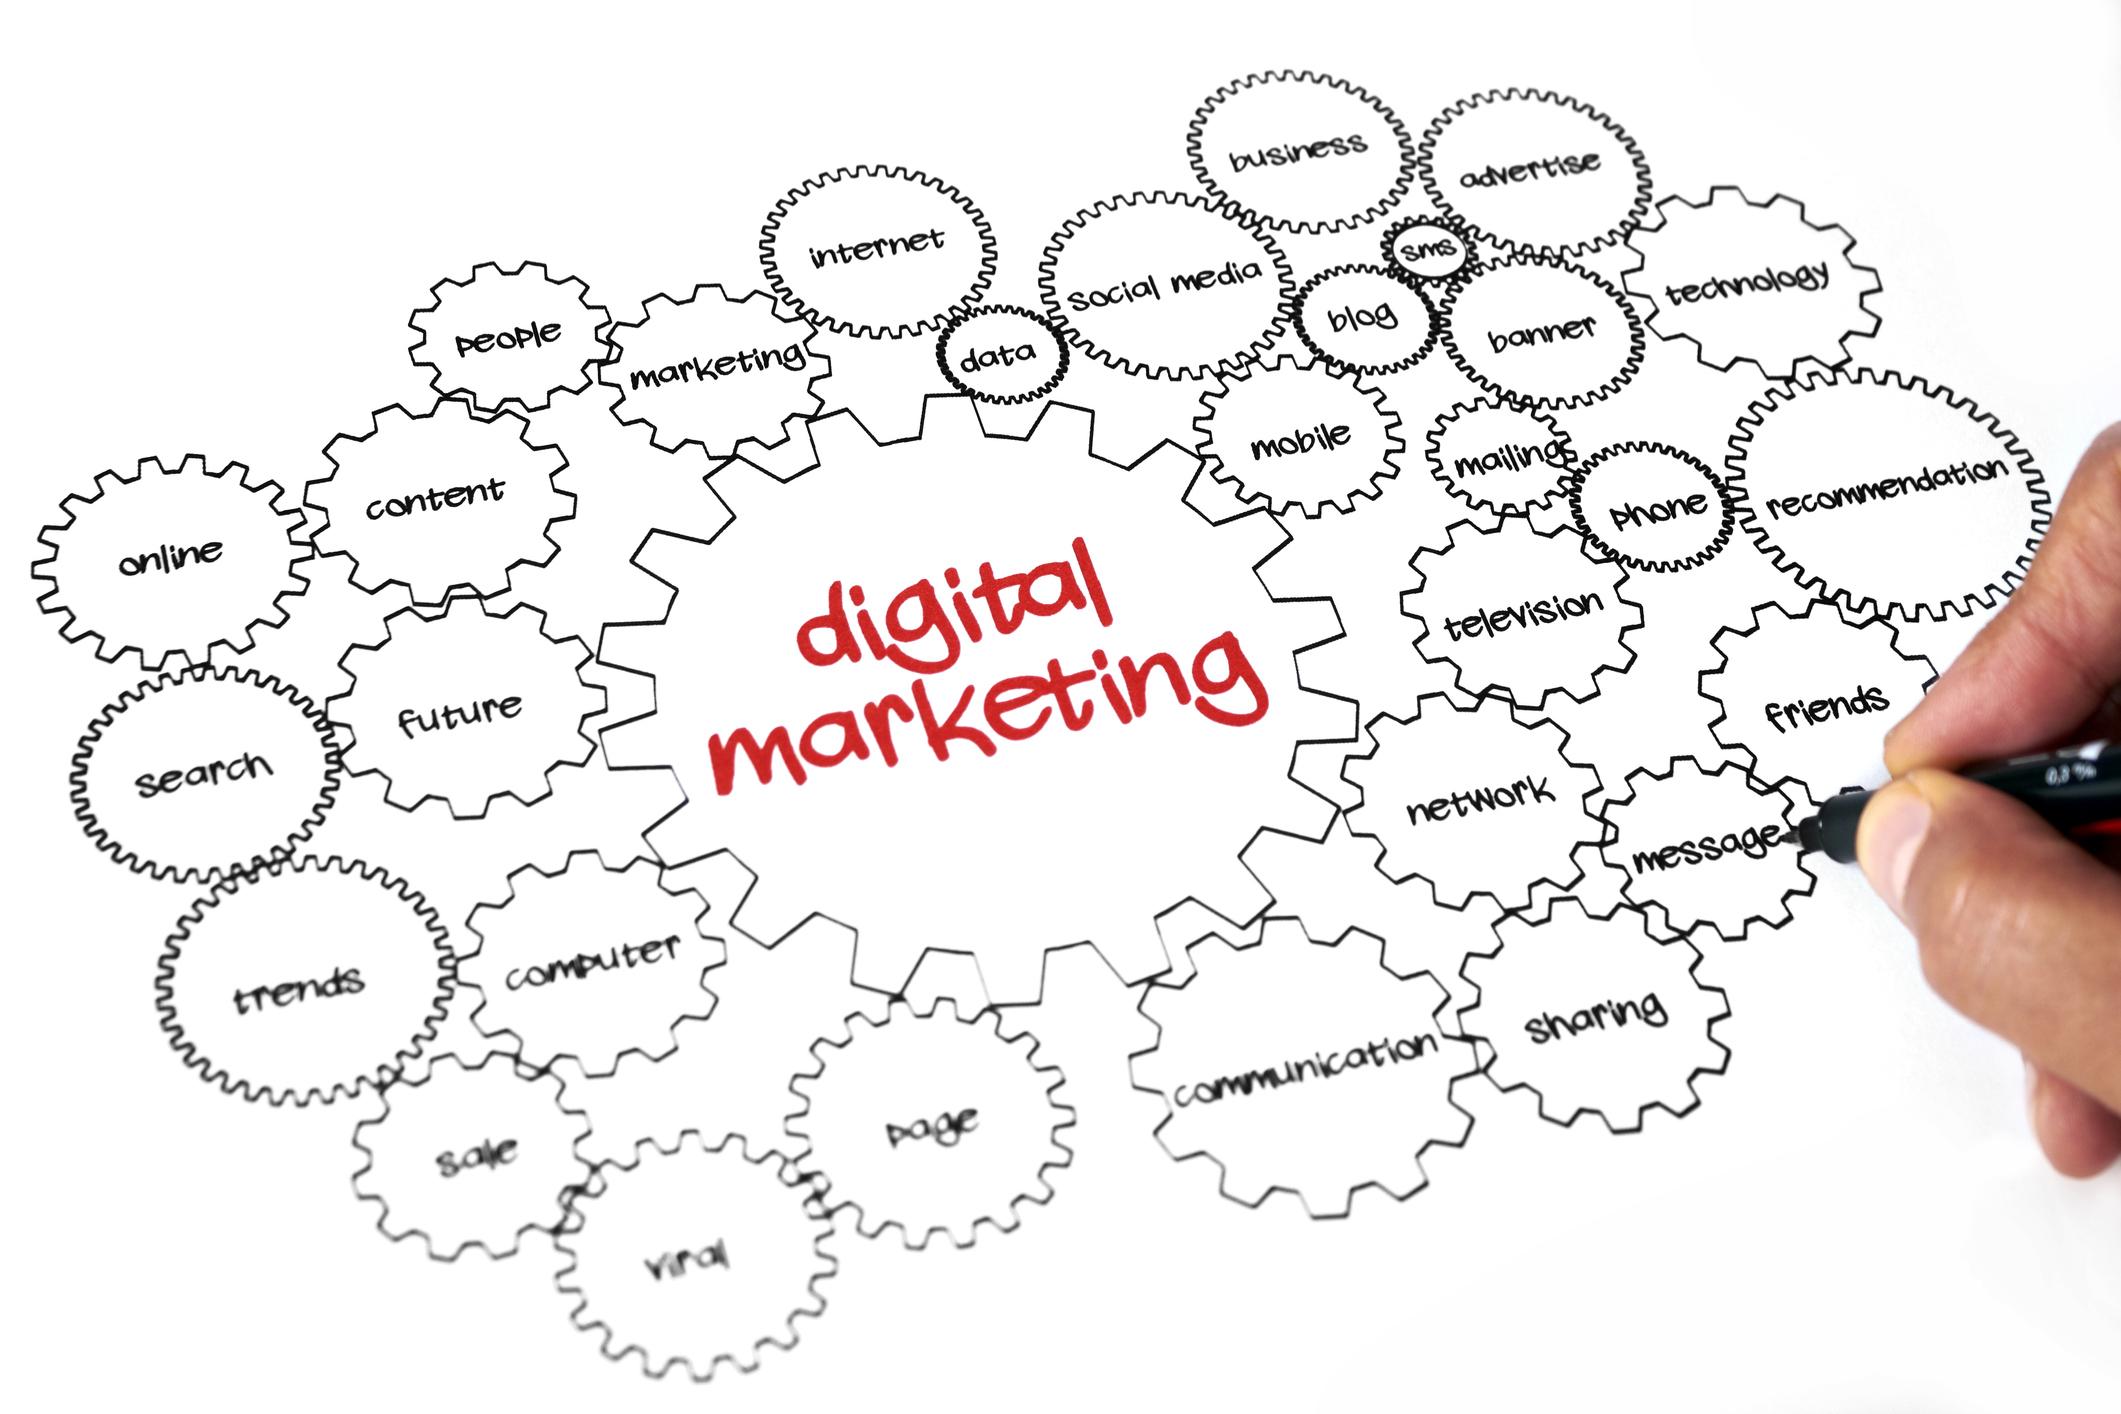 white board with digital marketing written in the center, representing digital marketing for financial advisors